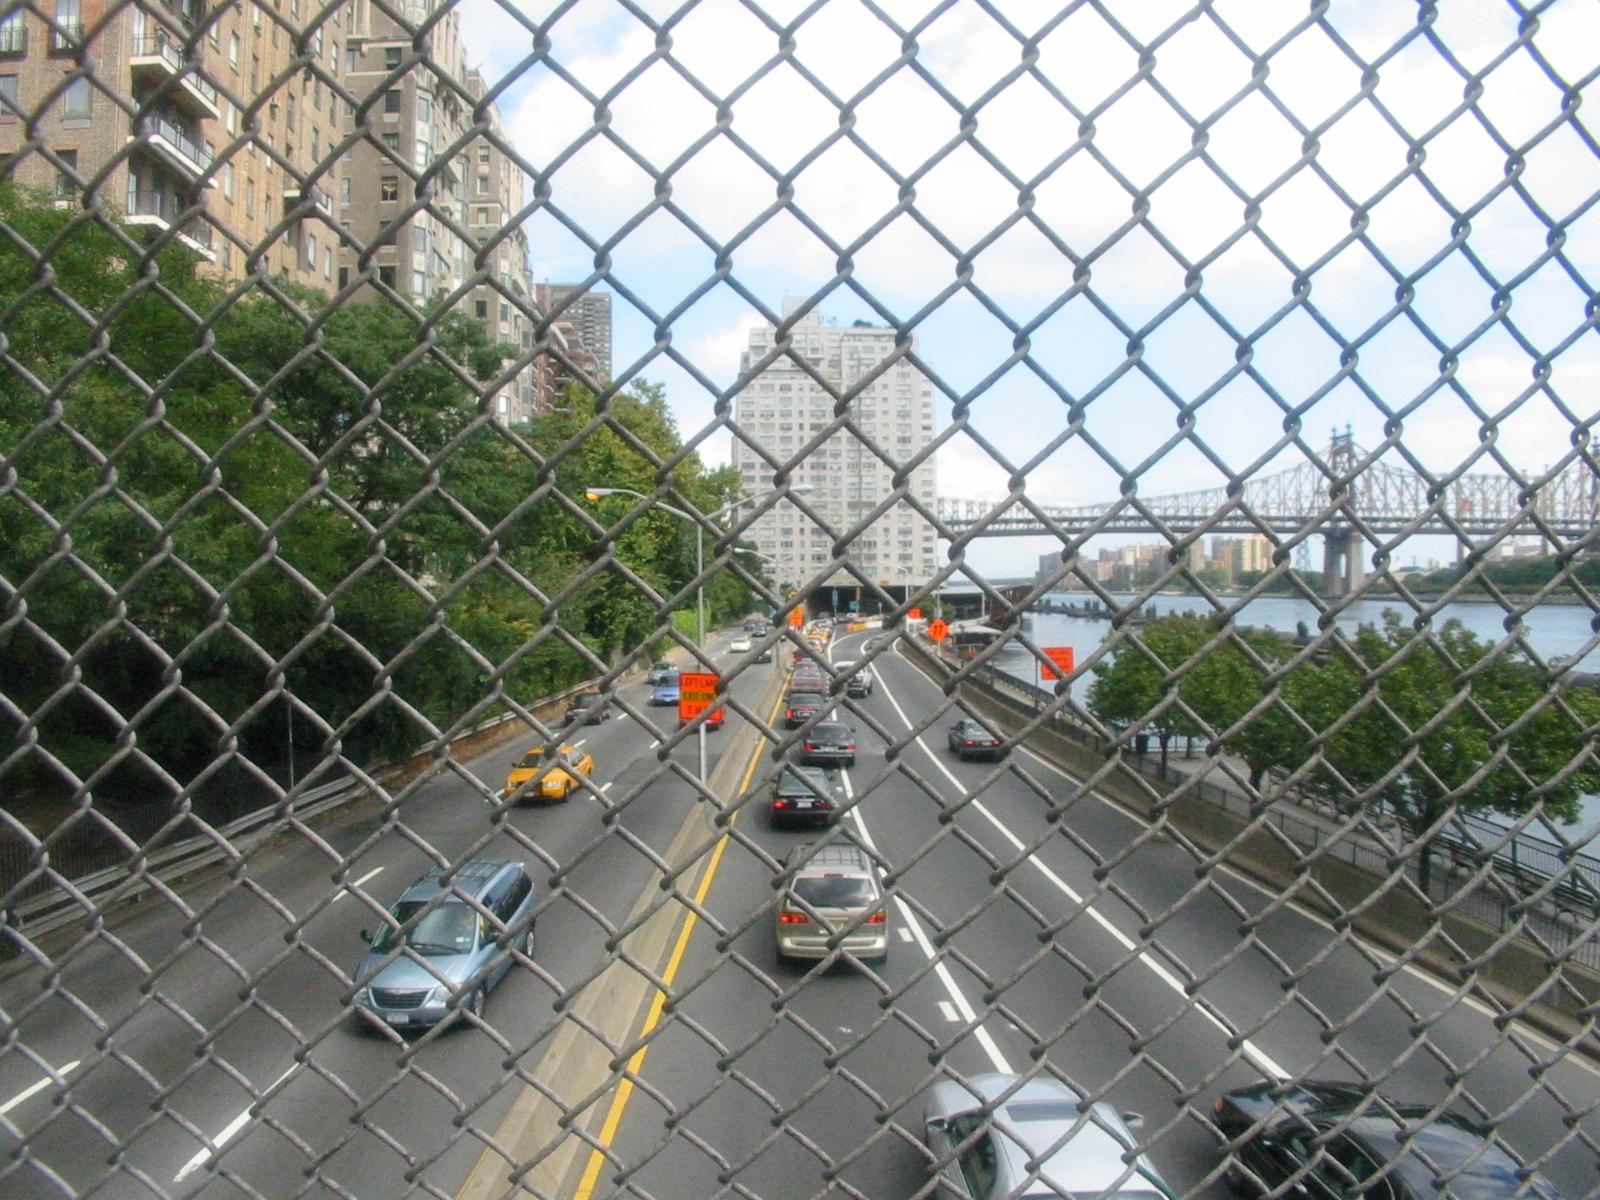 View from E 51st Street Pedestrian Crossing